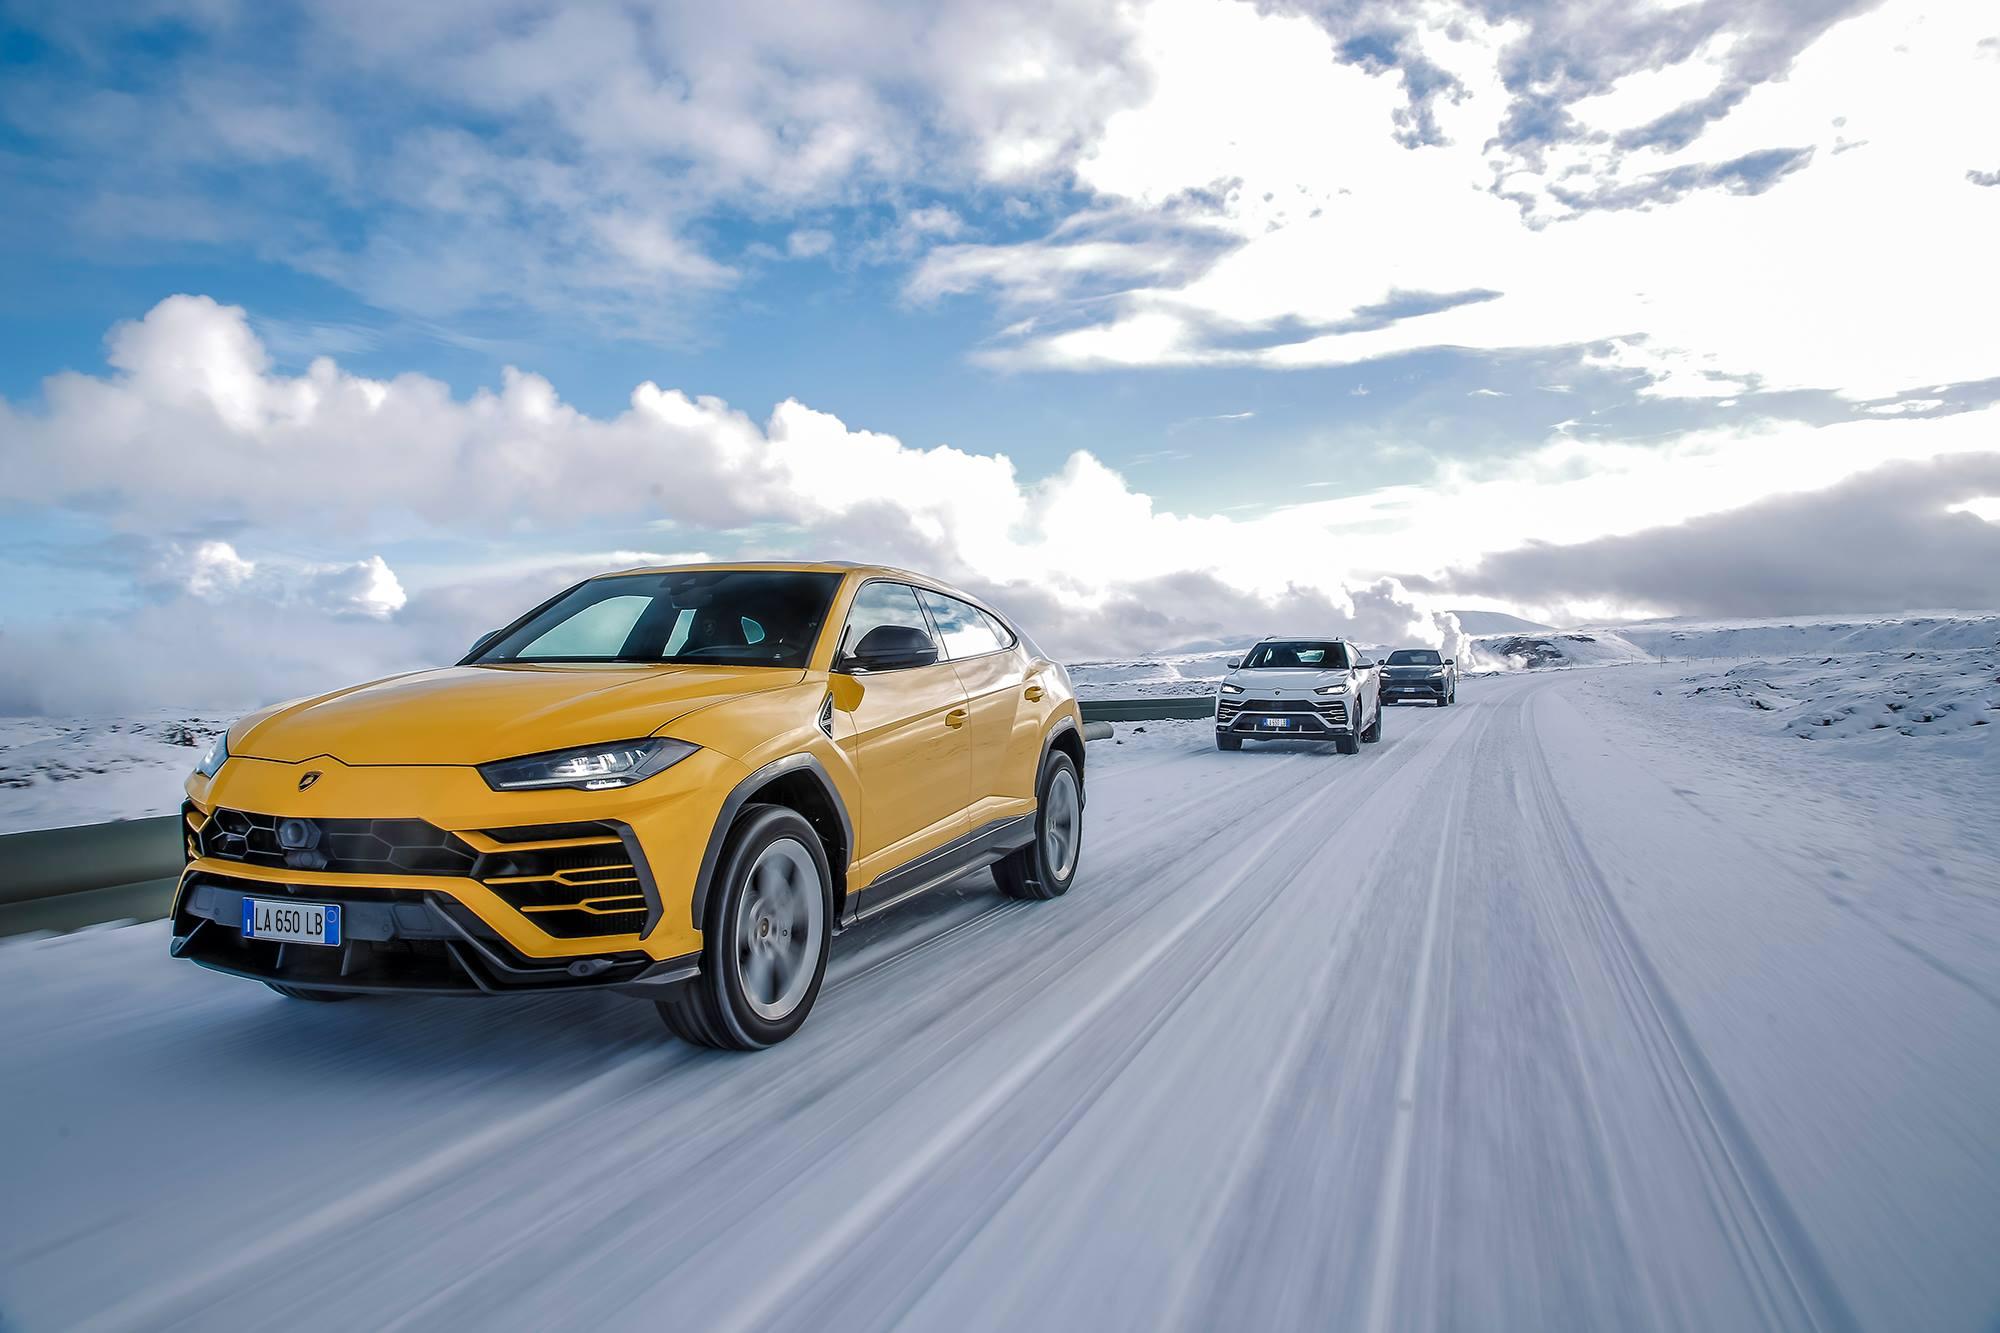 Lamborghini Urus Sturdiness and Speed